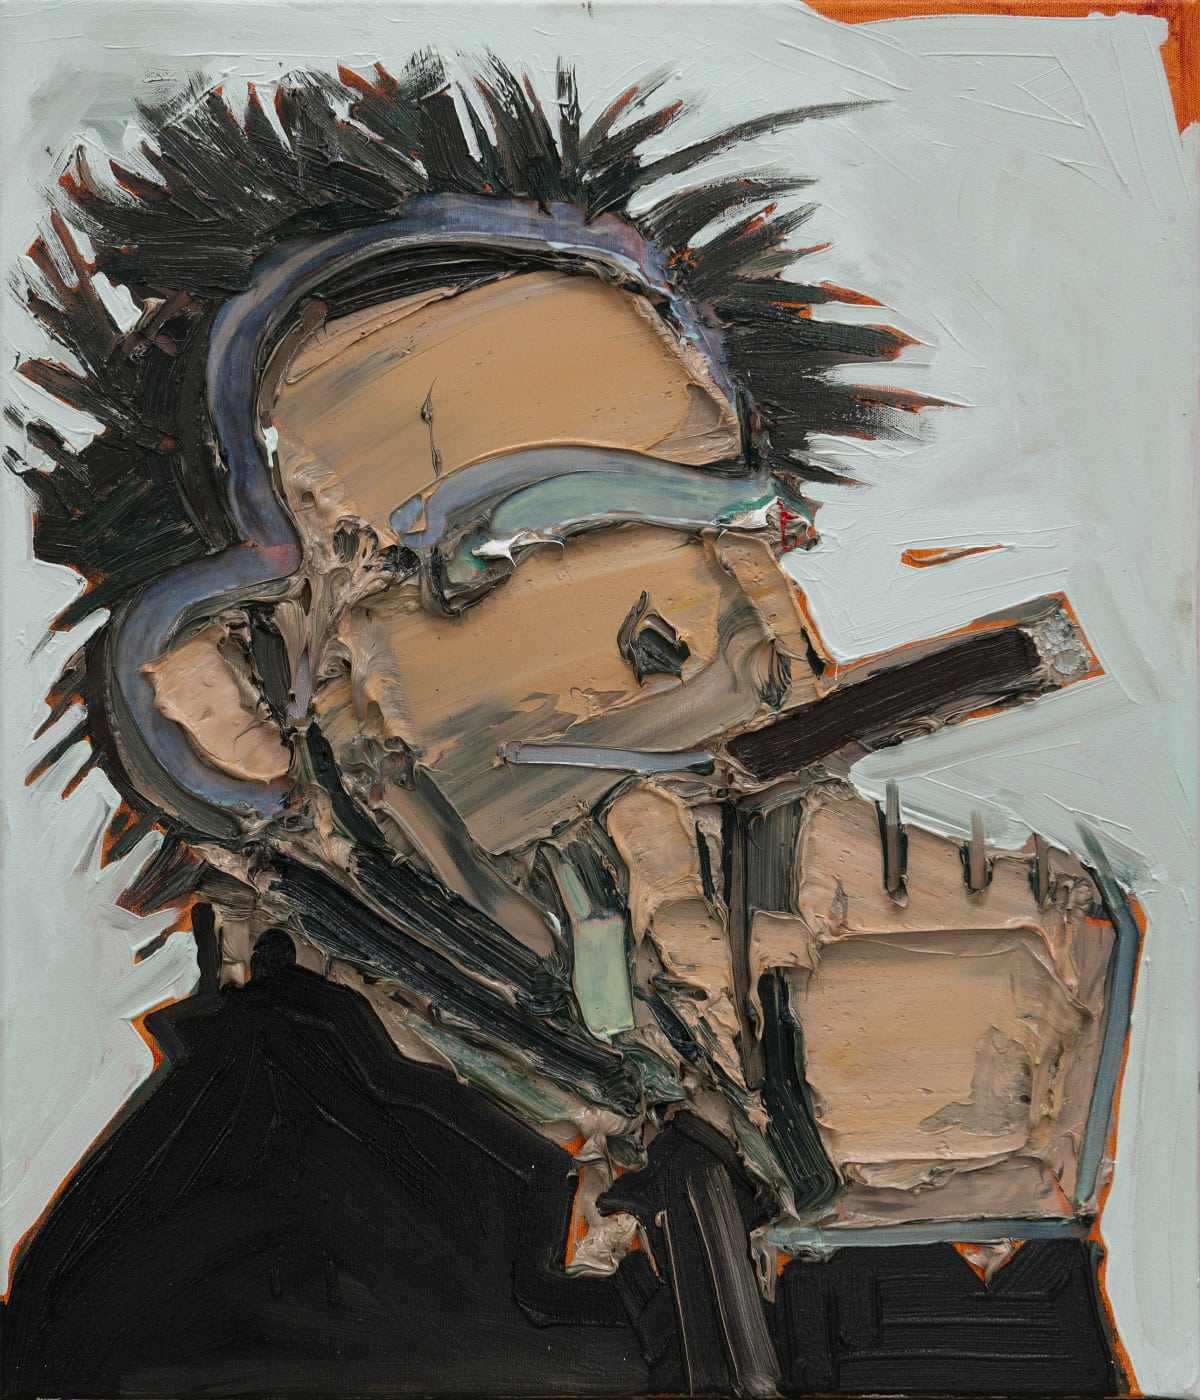 Toby Raine Jack Nicholson Smoking A Cigar, 2018 Oil on linen 70 x 60 cm 27 1/2 x 23 5/8 in